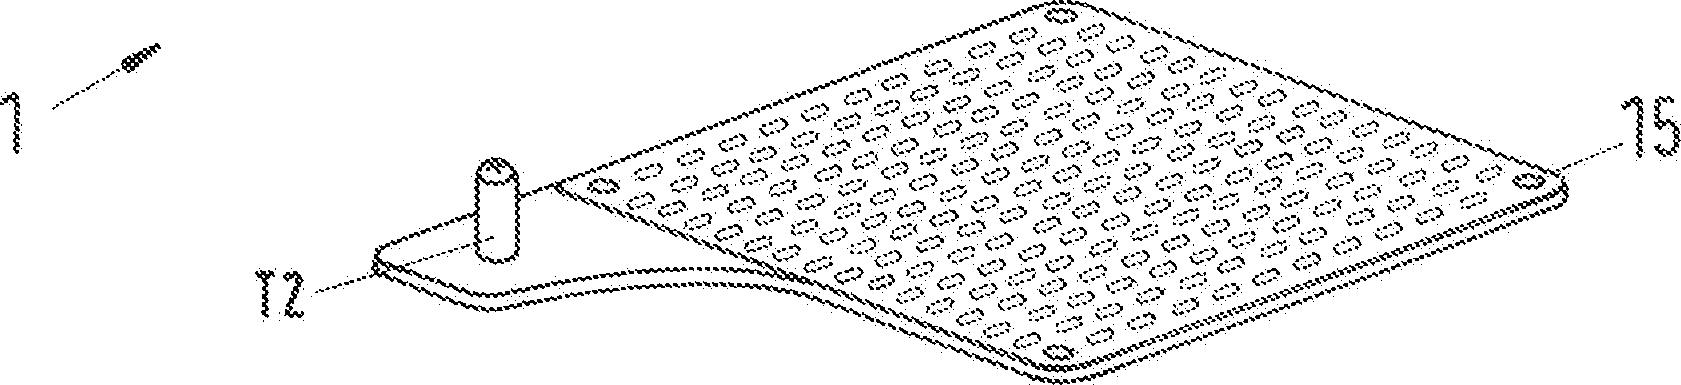 Figure GB2560938A_D0026